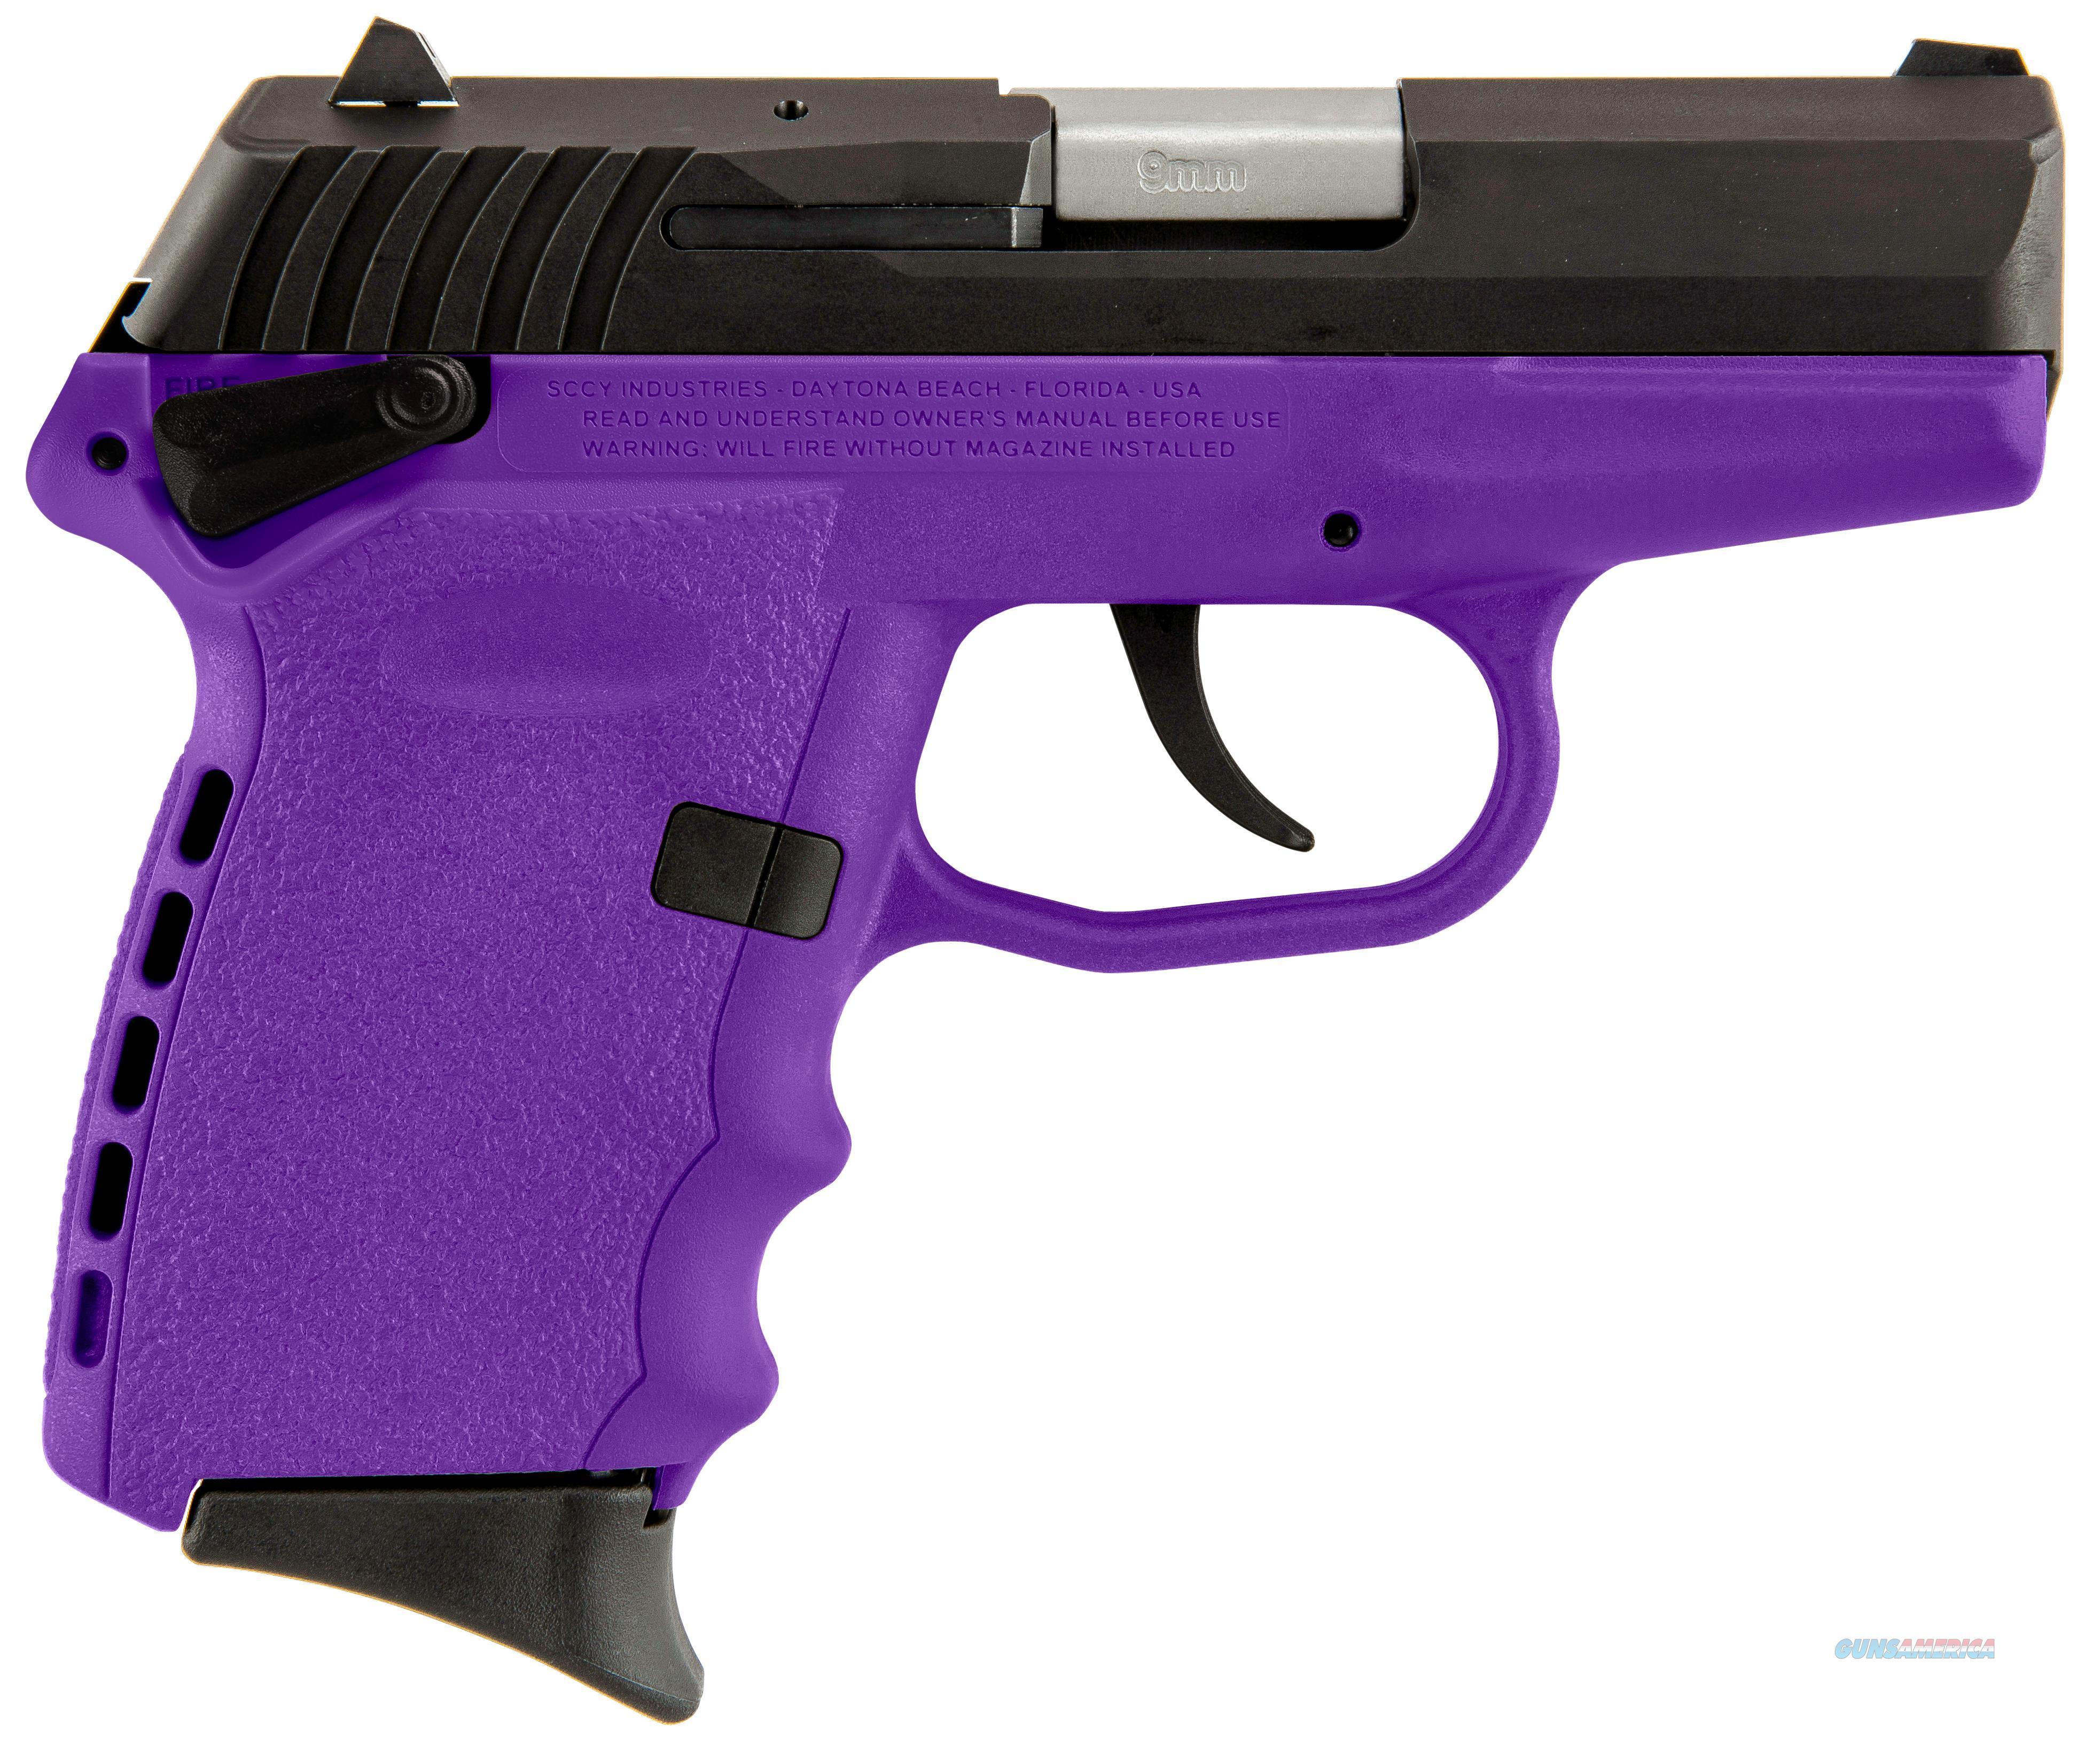 Sccy Cpx-1 Cmpu 9Mm Black/Purple (Double Sided Safety) CPX1-CBPU  Guns > Pistols > S Misc Pistols